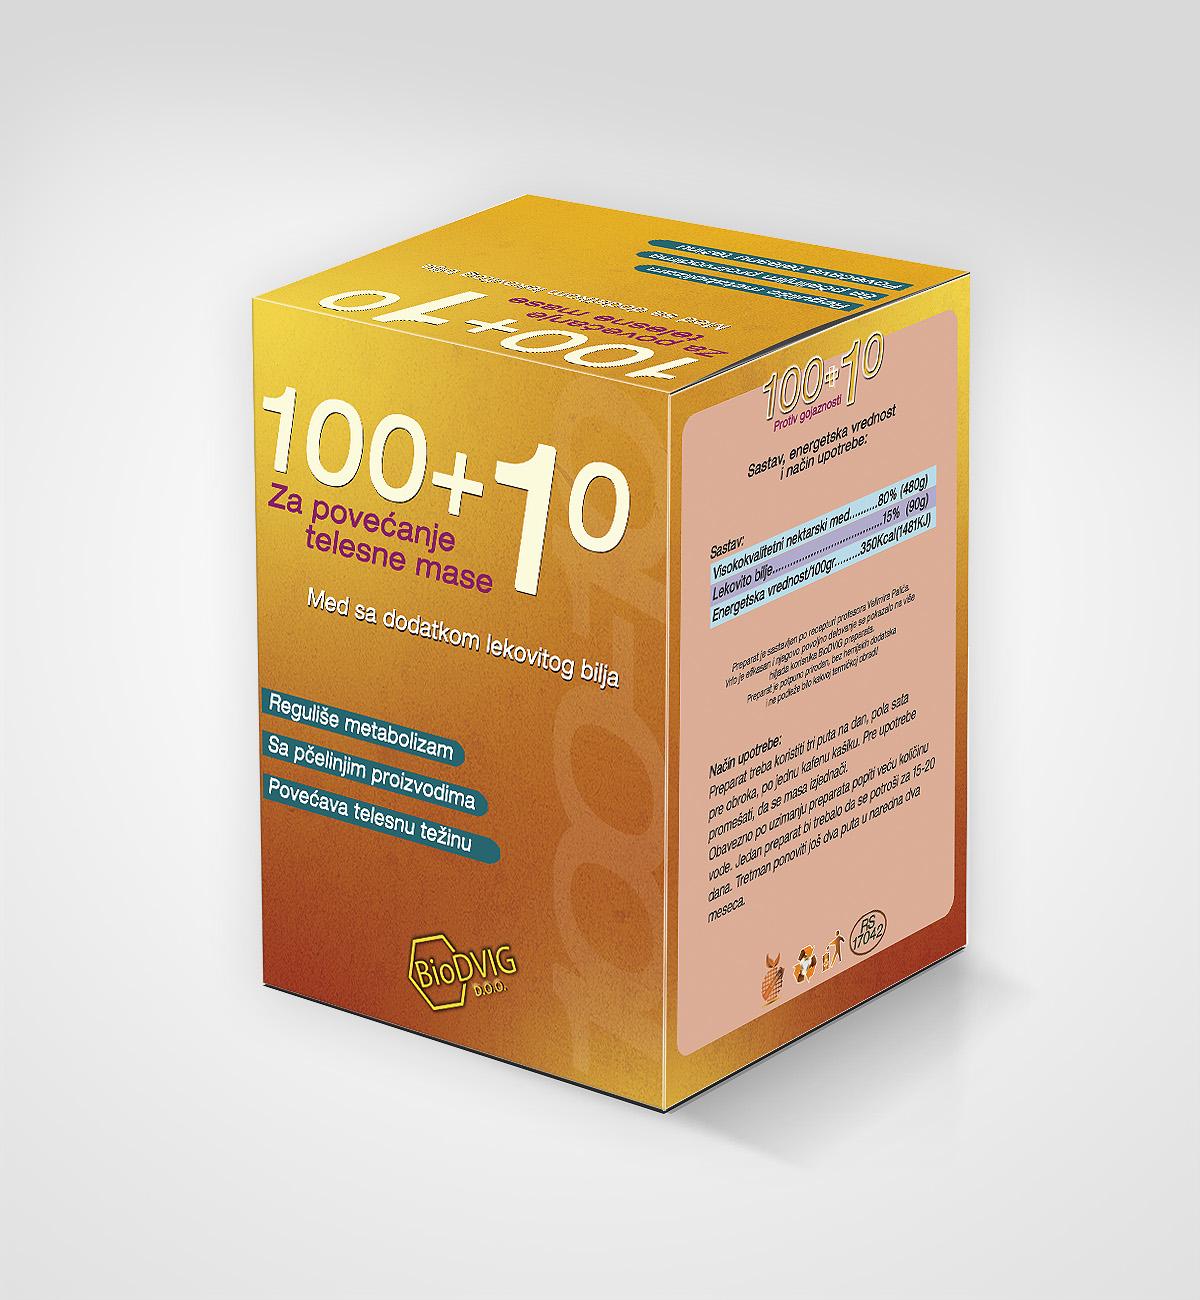 100+10 - Biogvig DOO